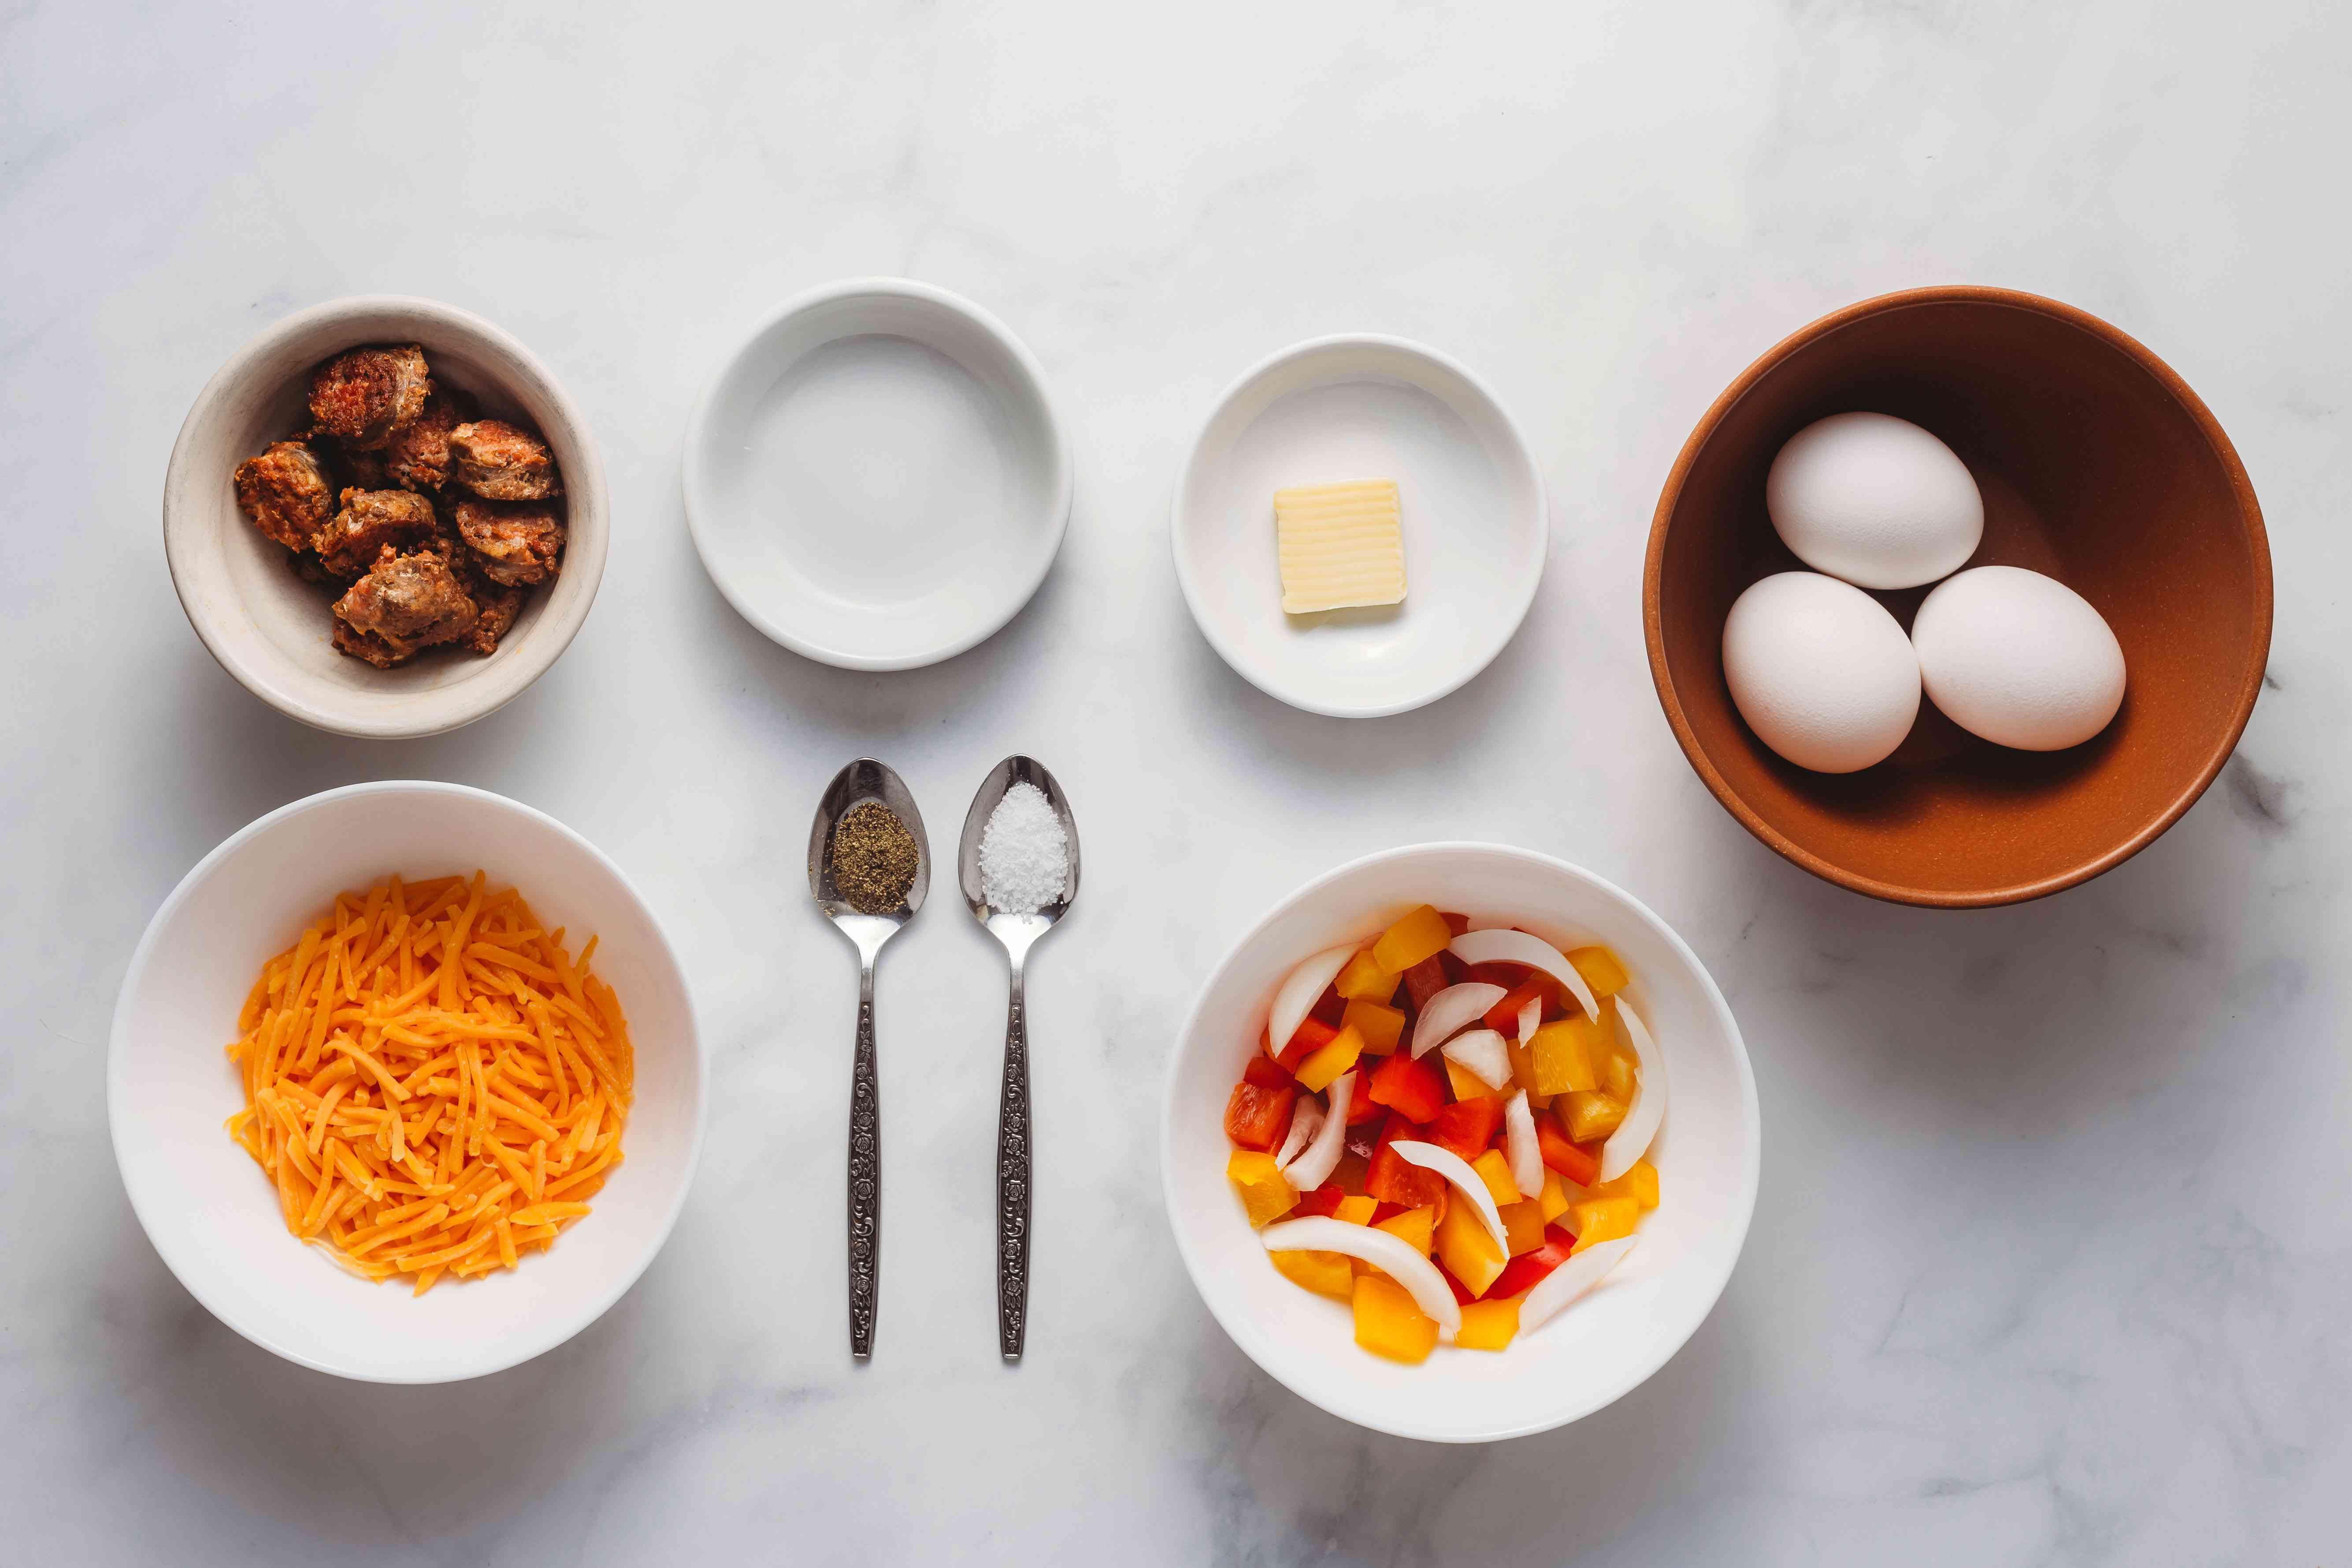 Ingredients for omelet for kids